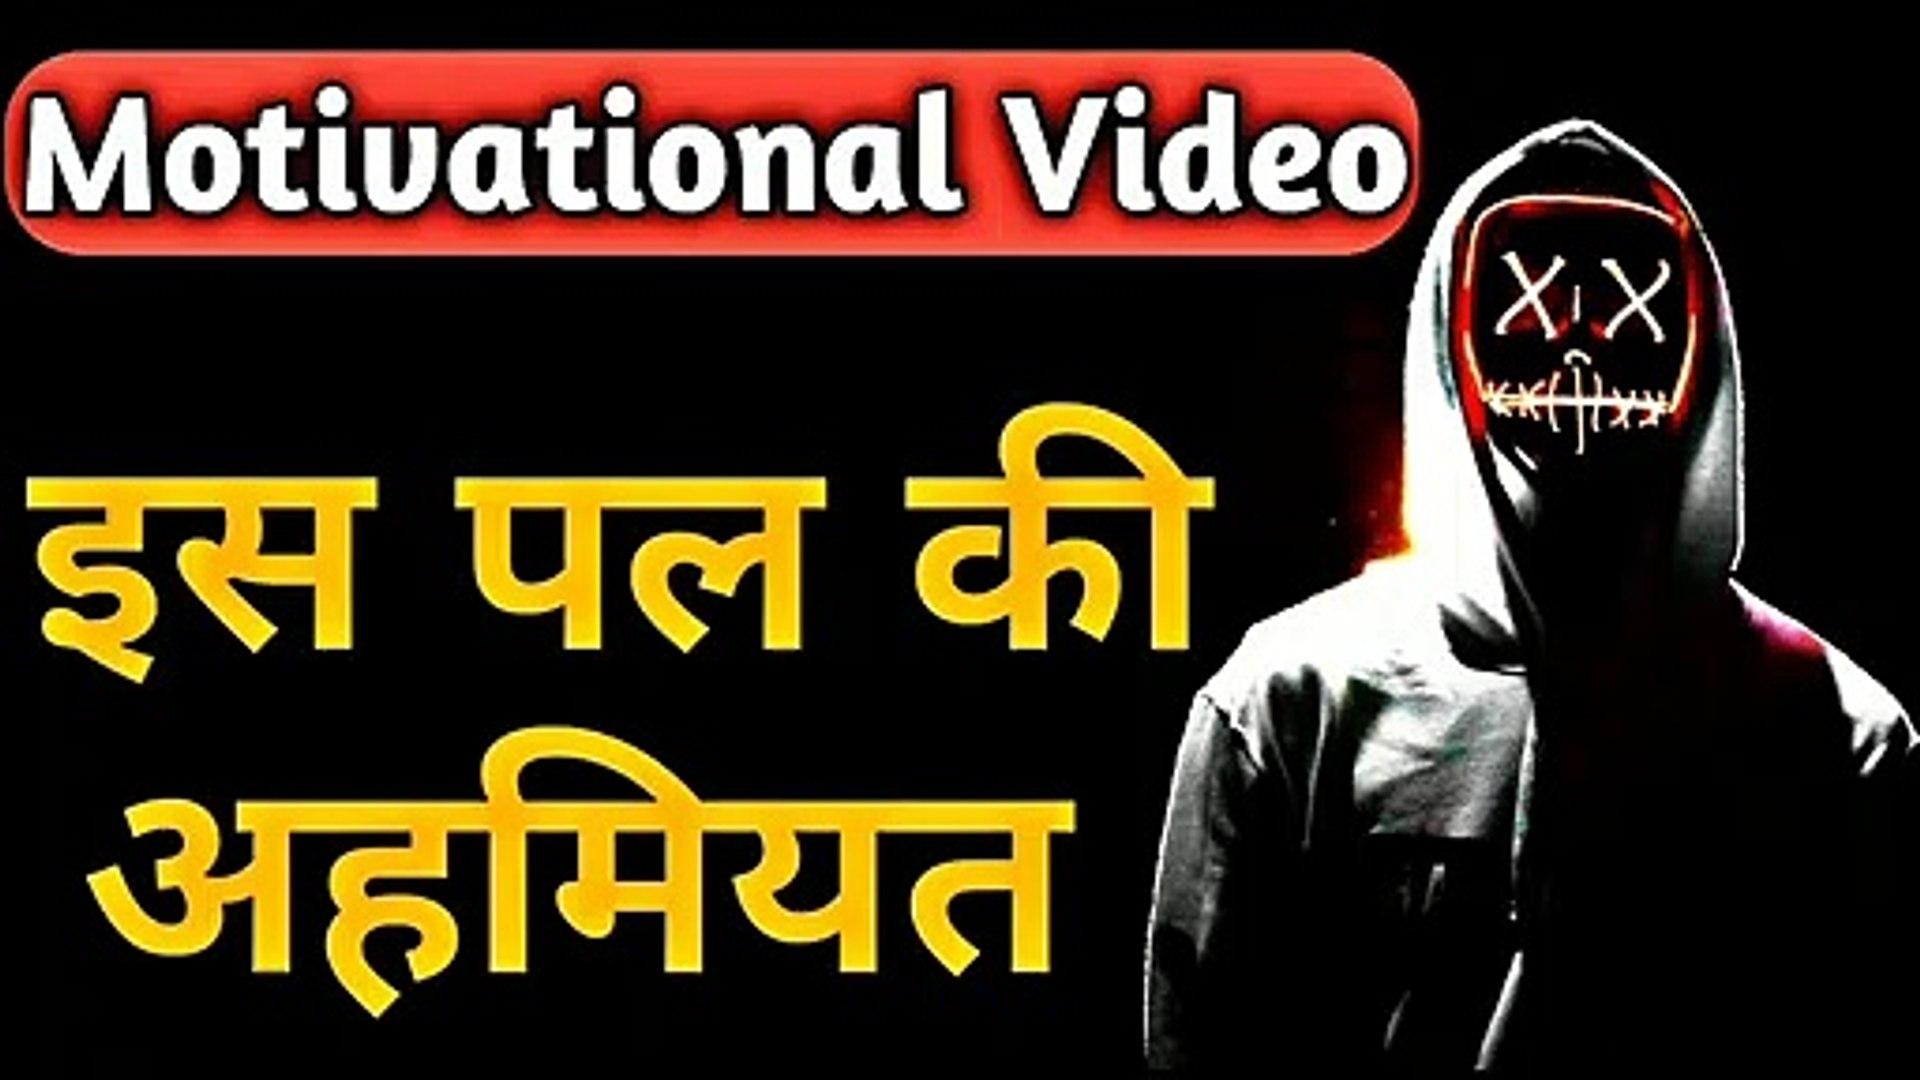 Latest Motivational Video in Hindi | Kaash Motivational Video | Willingness power